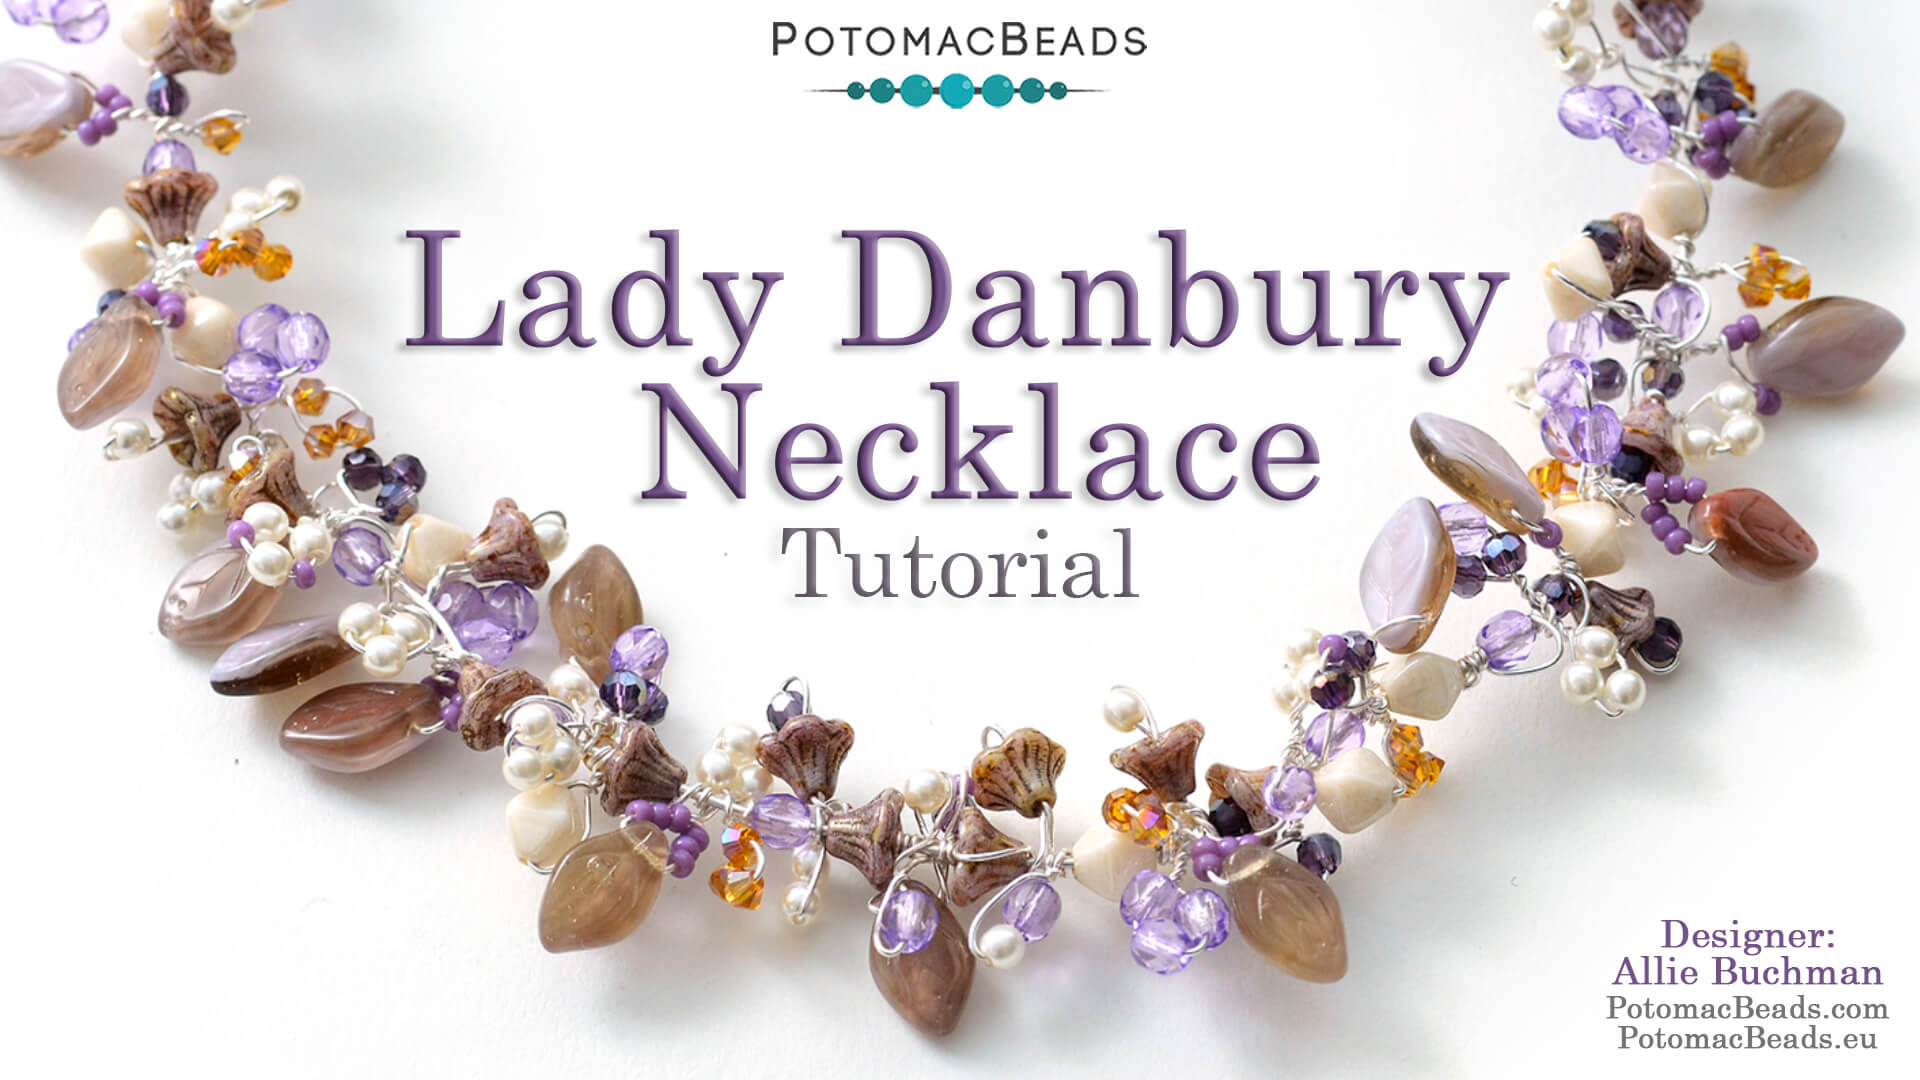 How to Bead Jewelry / Beading Tutorials & Jewel Making Videos / Bead Weaving Tutorials & Necklace Tutorial / Lady Danbury Necklace Tutorial